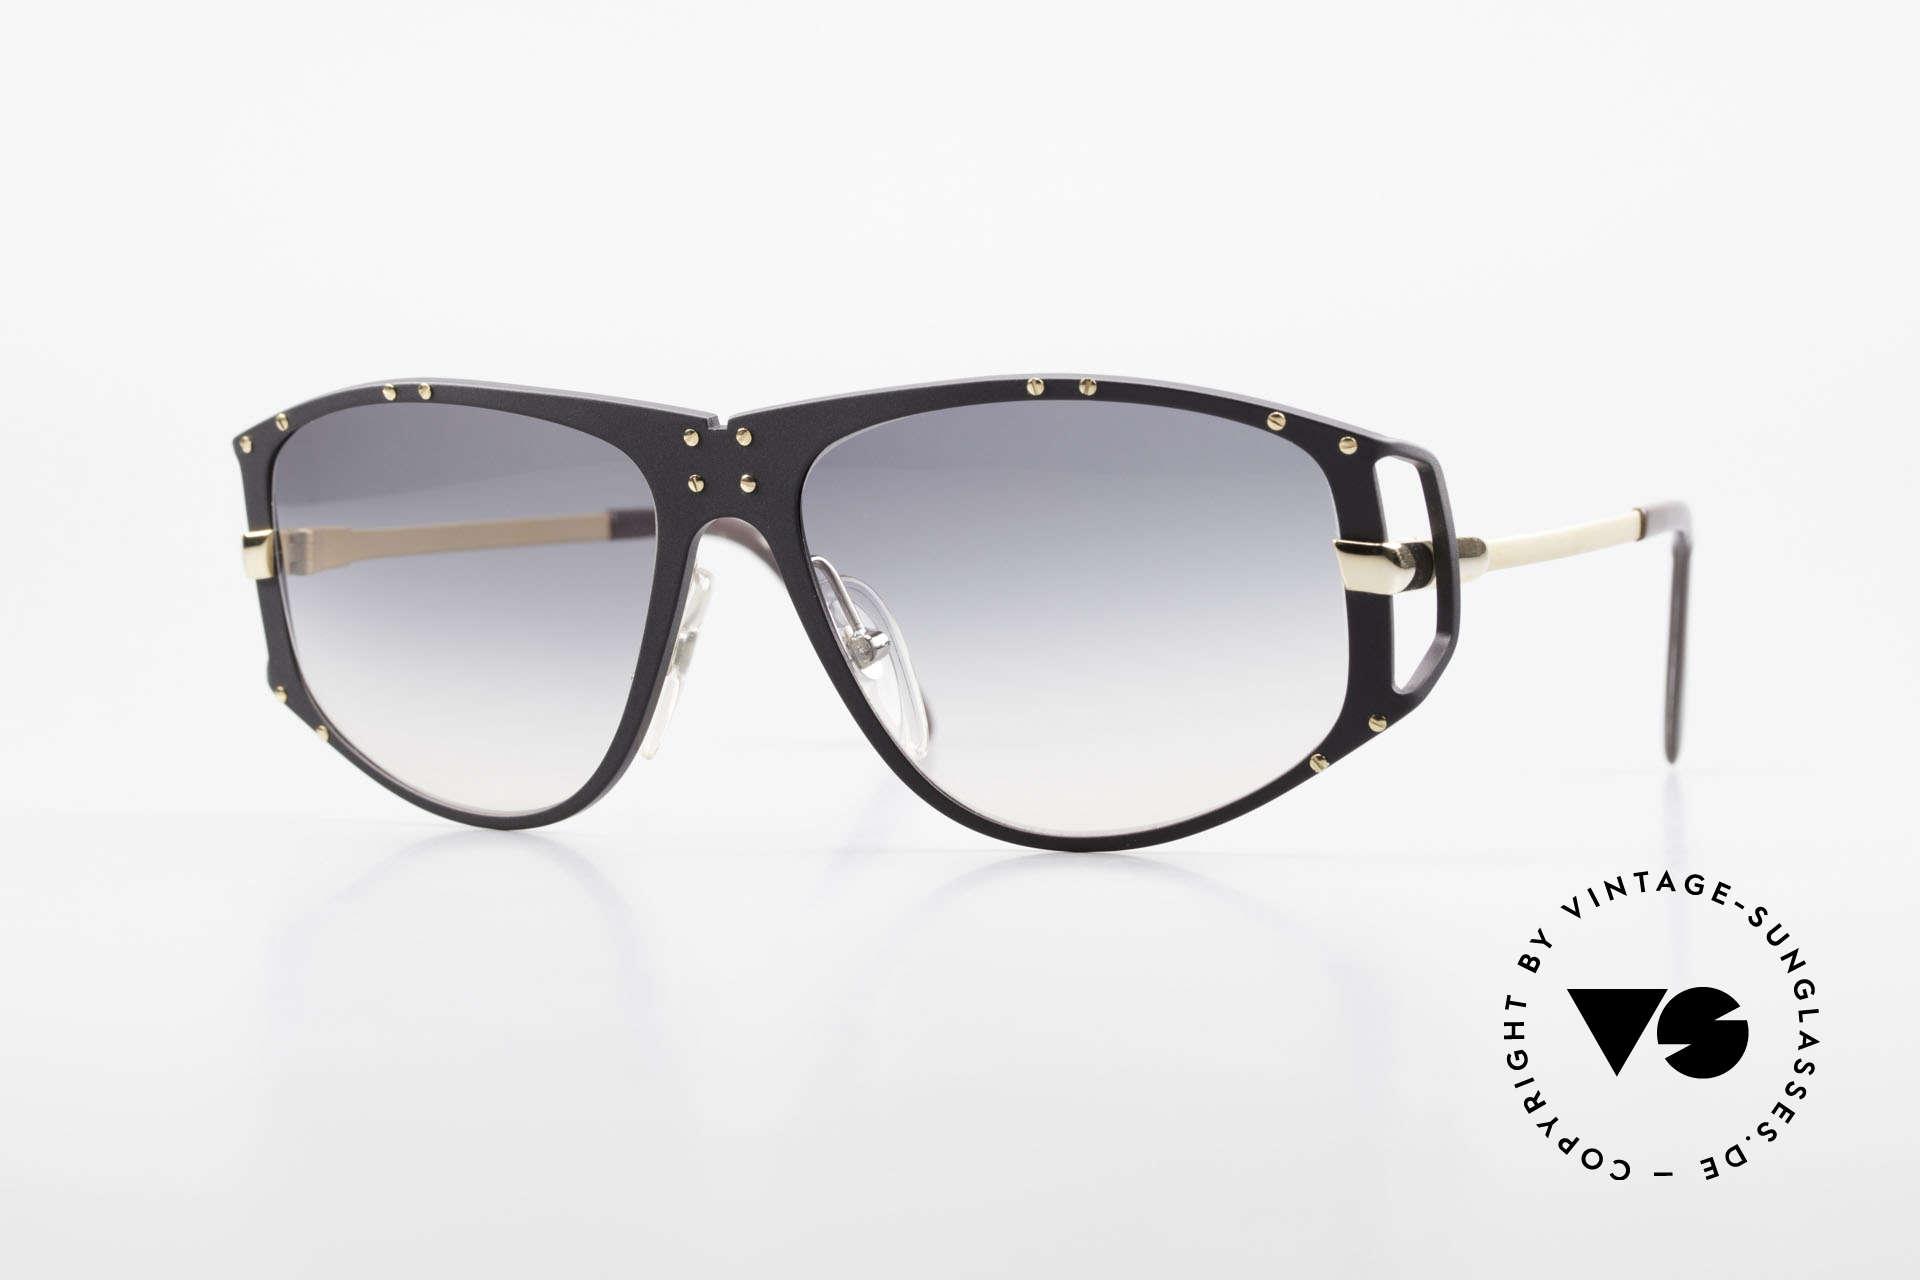 Alpina A51 Ultra Rare 90's XL Sunglasses, Alpina Model A51 = ultra rare vintage sunglasses, Made for Men and Women